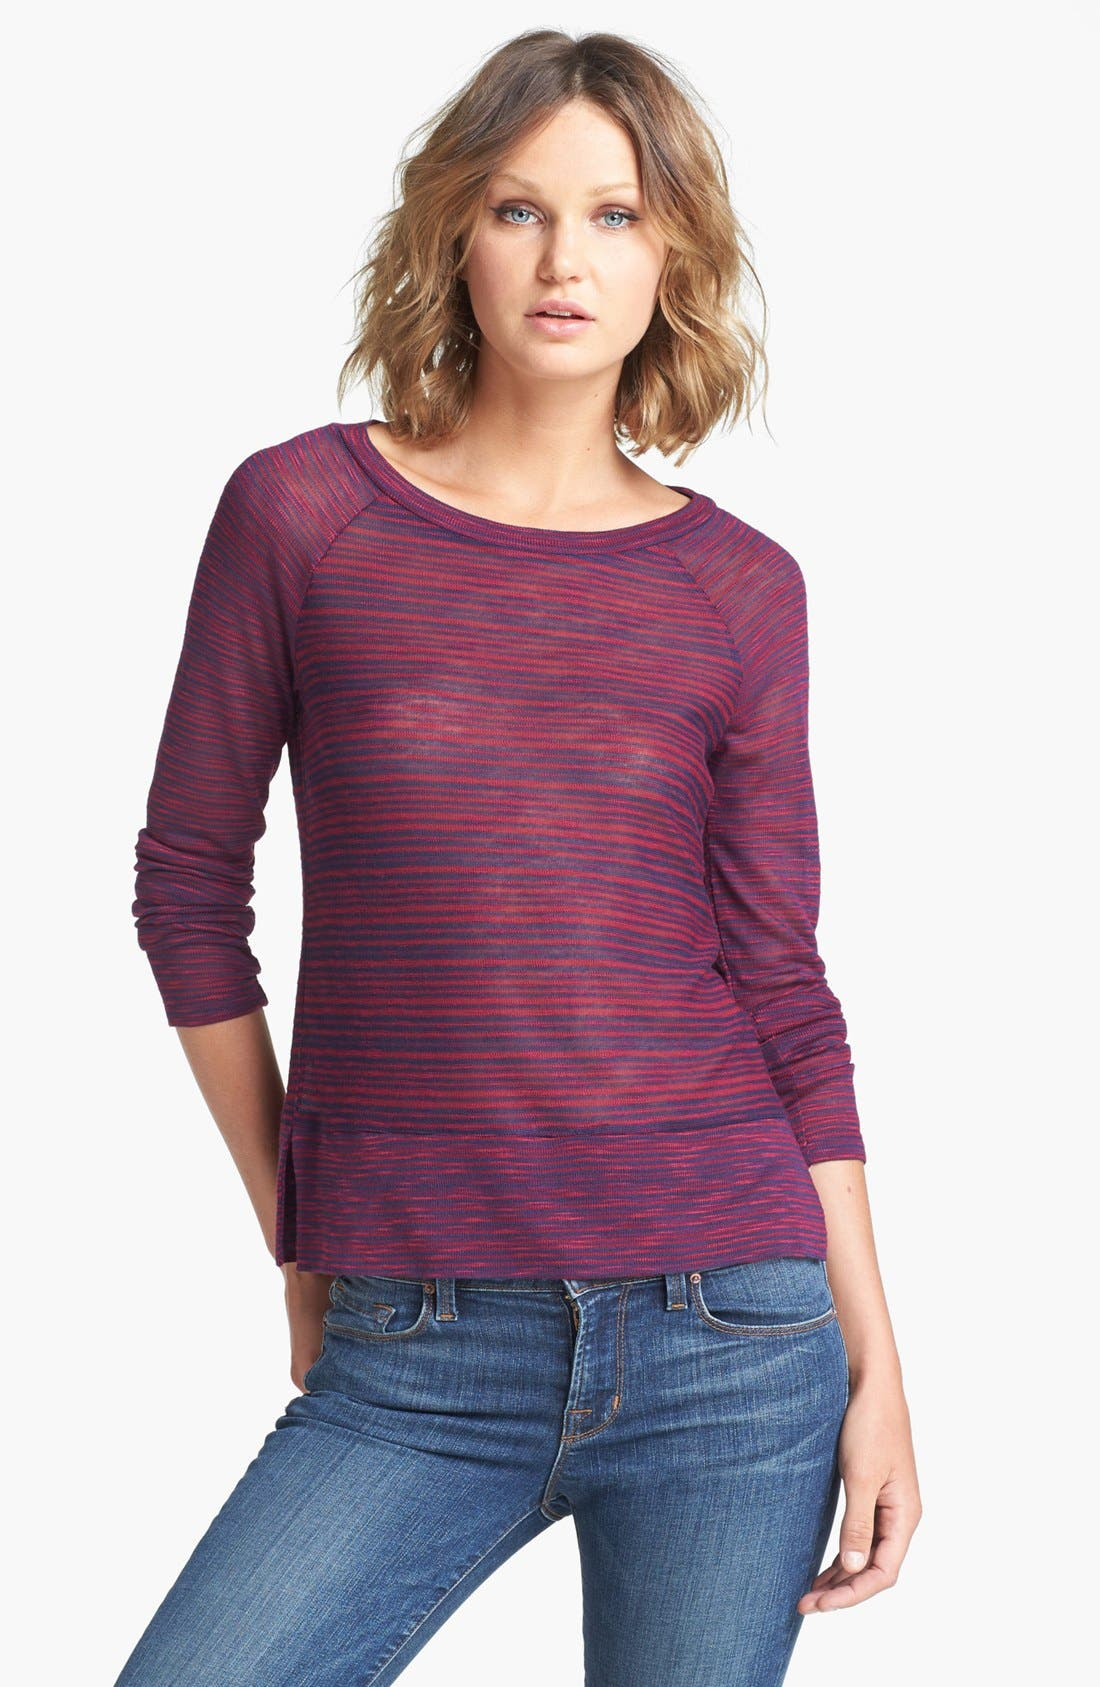 Main Image - Splendid 'West Village' Knit Pullover